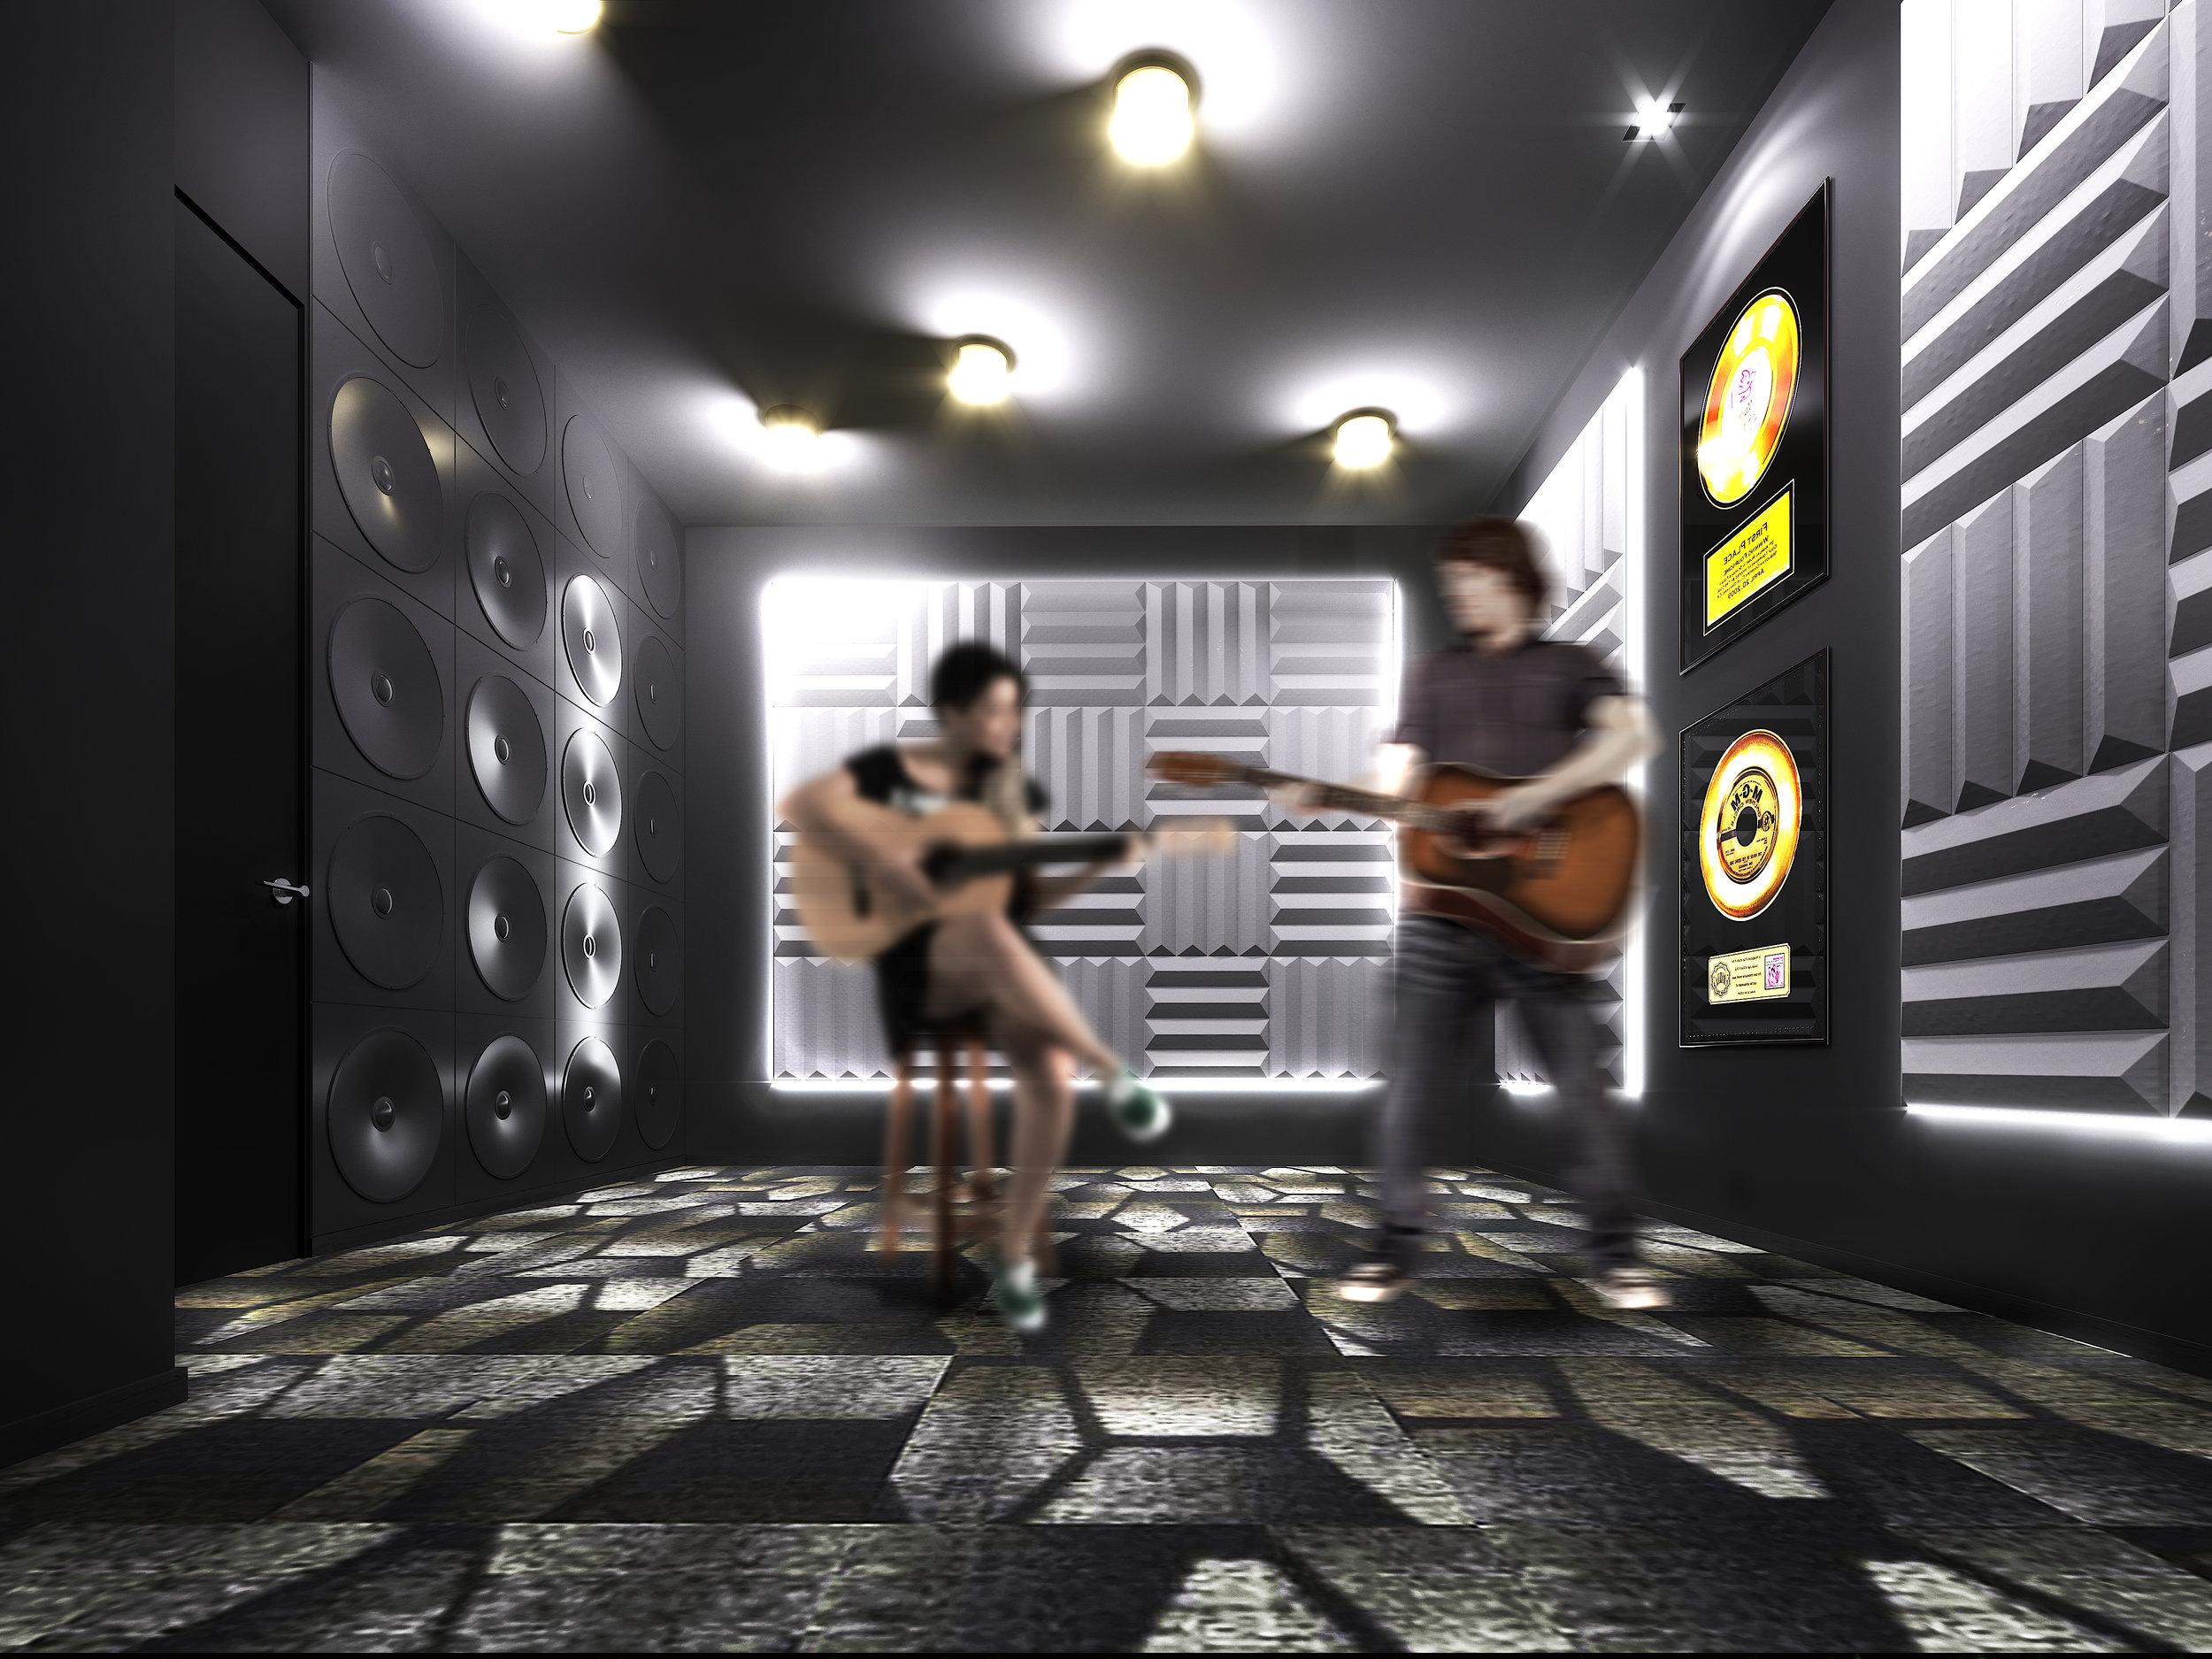 Youth Room_Music Room 004_02.jpg